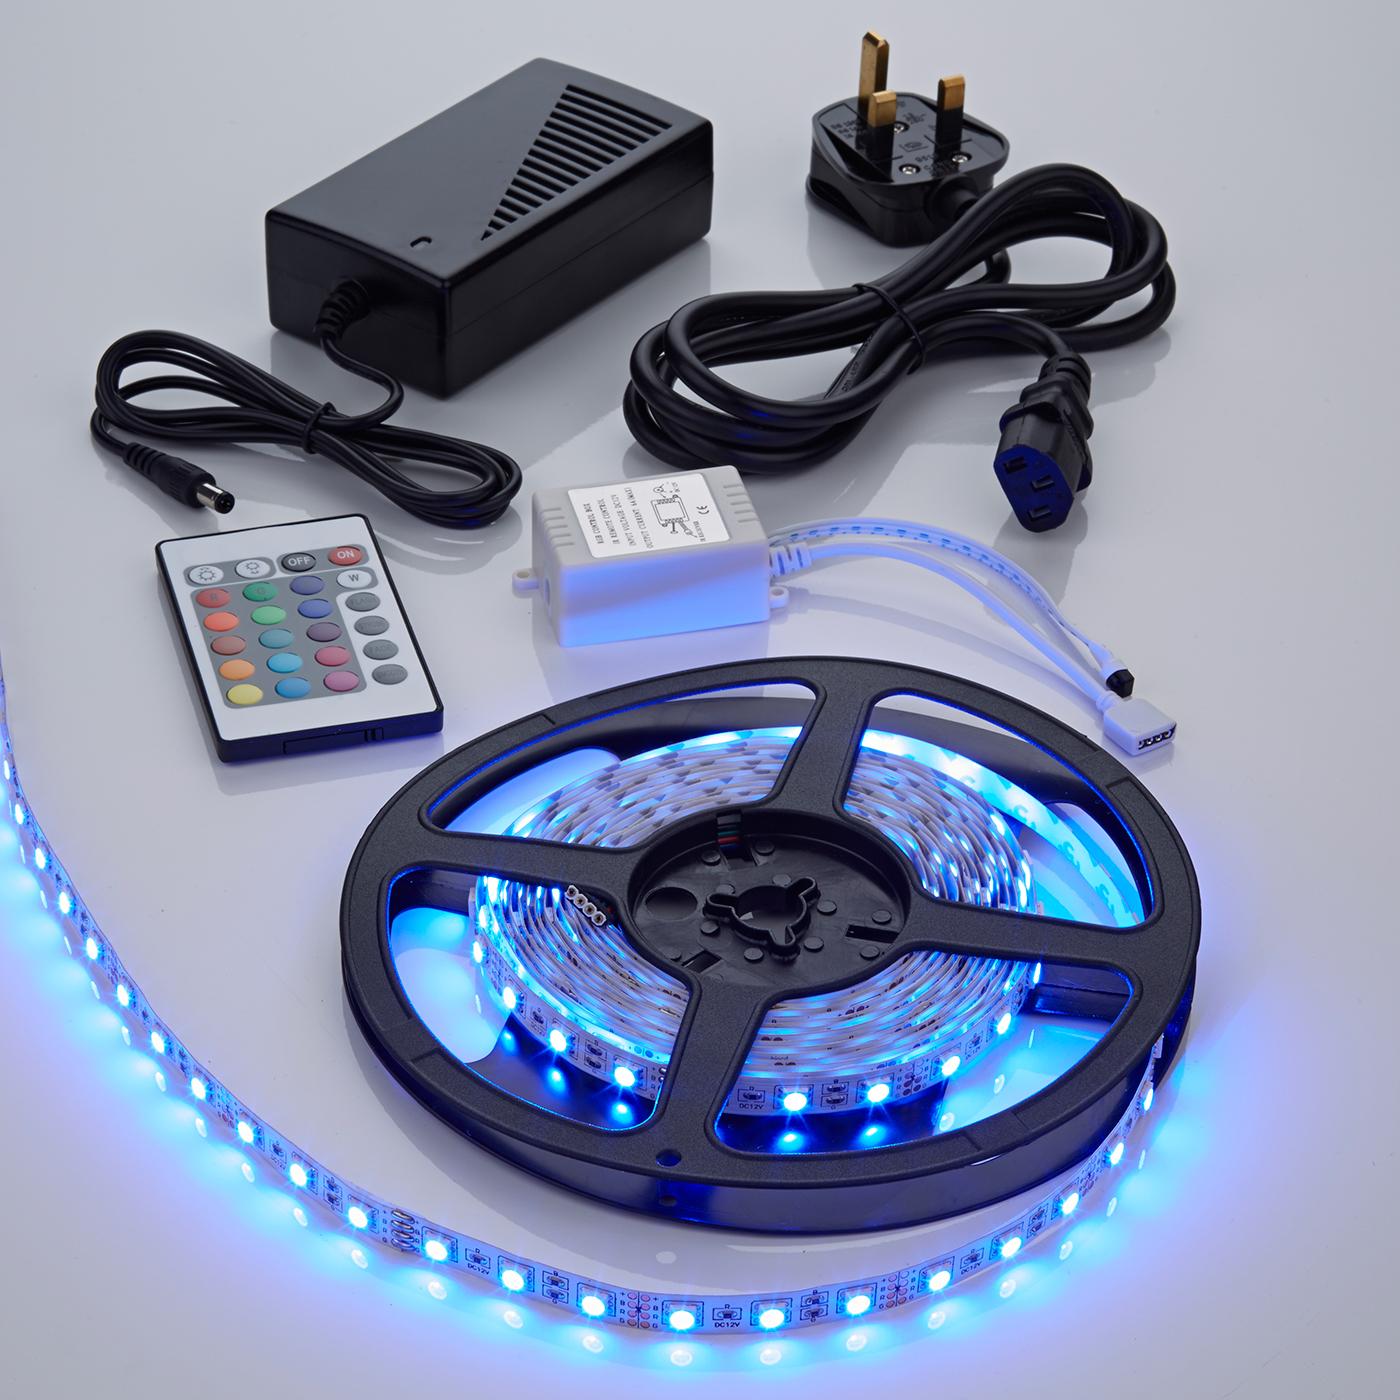 Biard LED IP20 5m 5050 Plug & Play Strip Light Kit - RGB